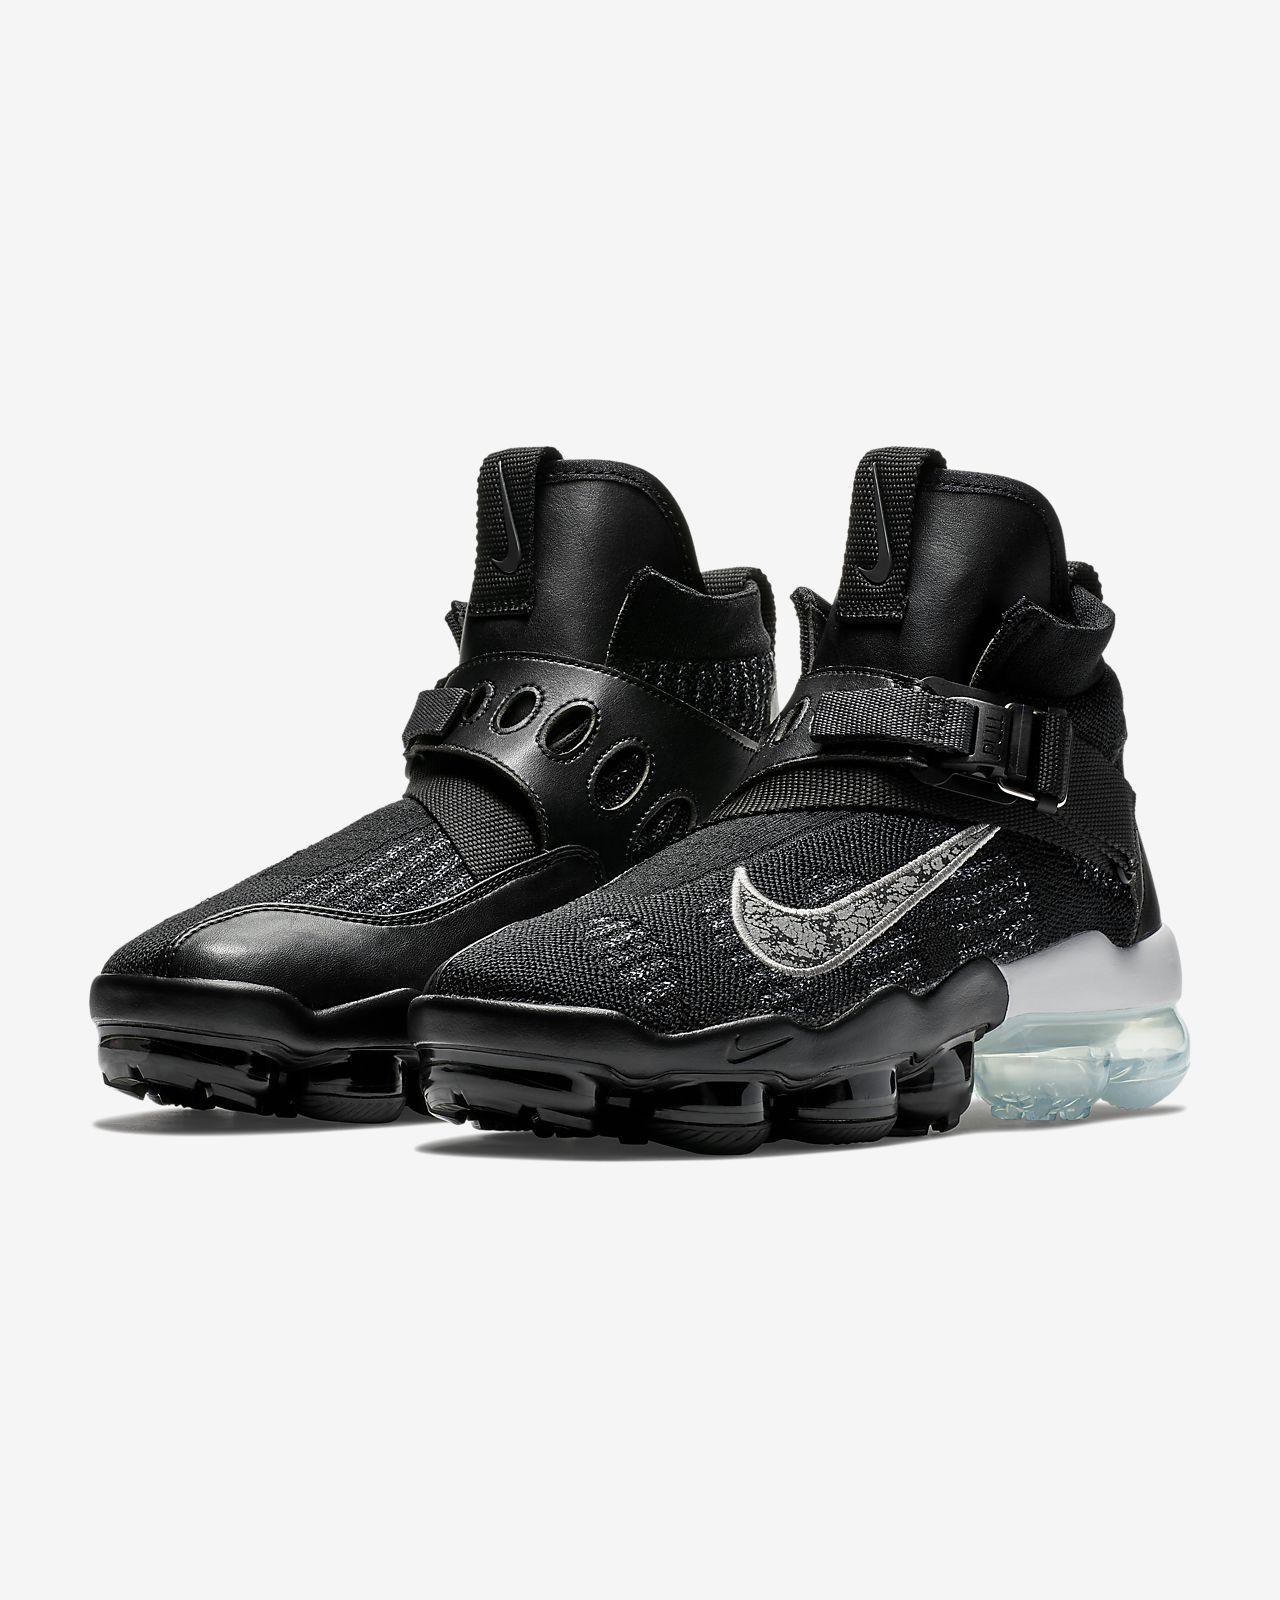 3bd86d38fc751 Nike Air VaporMax Premier Flyknit Men s Shoe. Nike.com GB